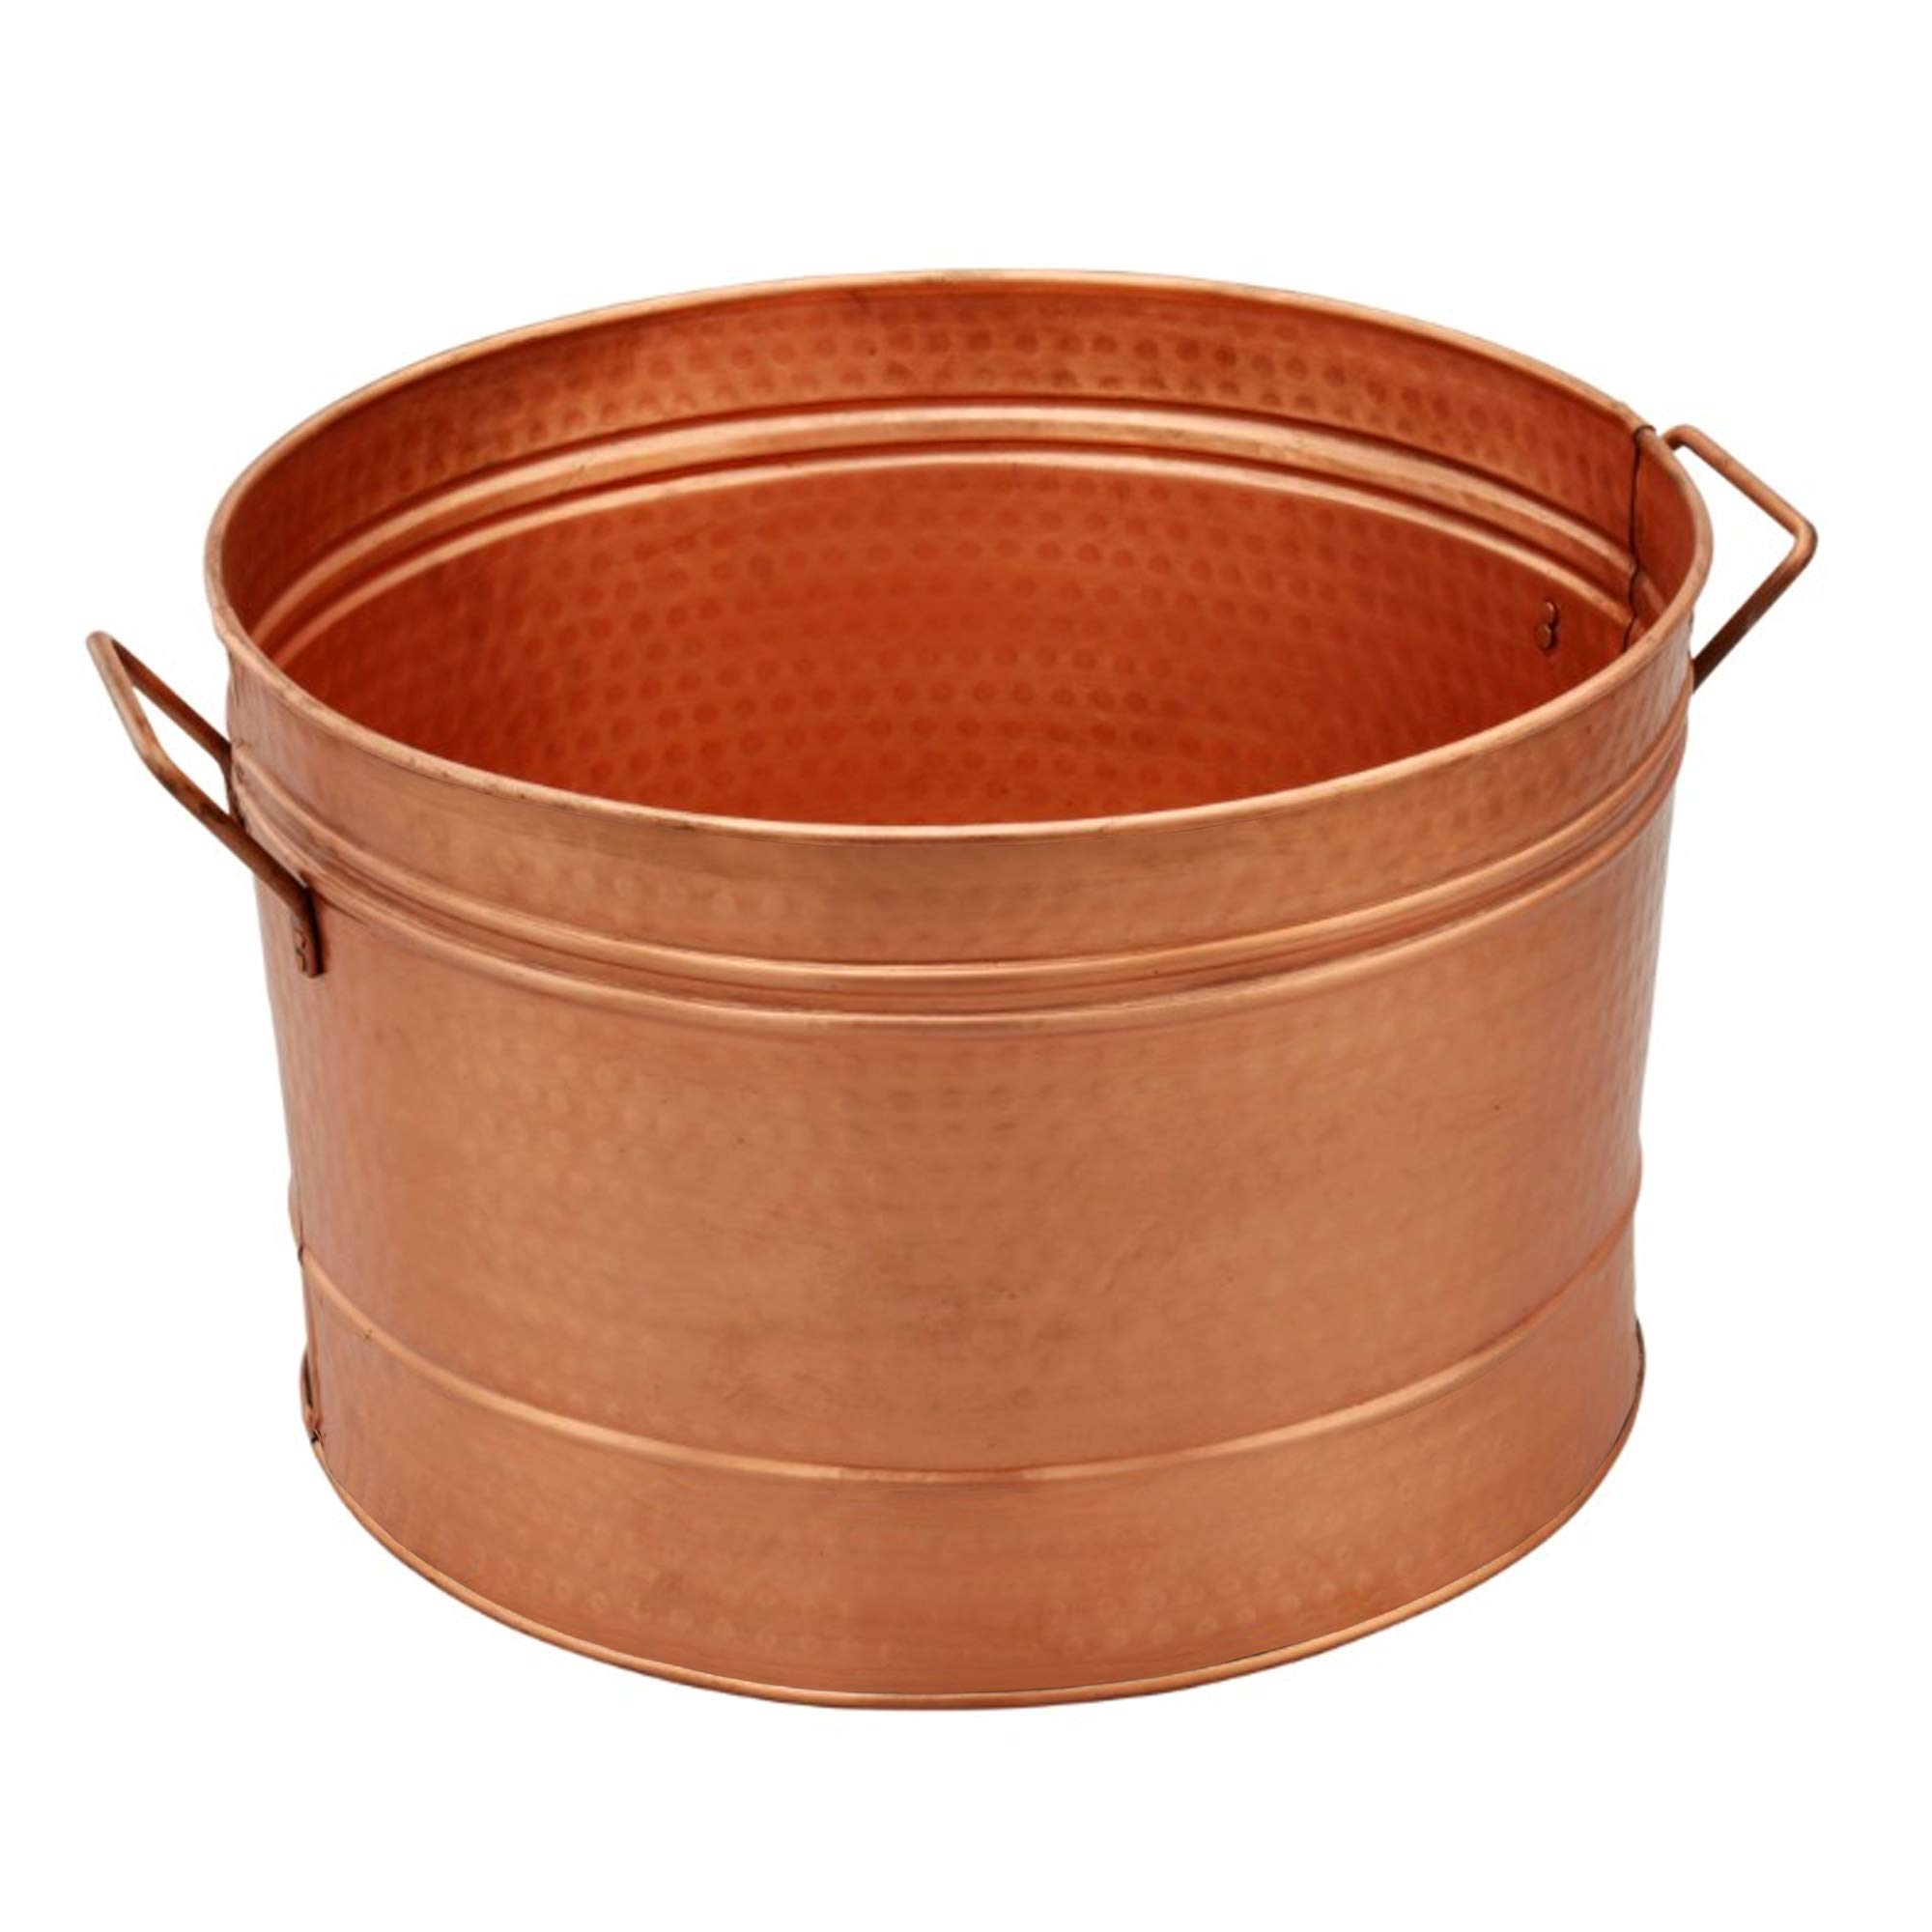 Benzara HGM008 Hammered Pattern Galvanized Farmhouse Style Tub Copper